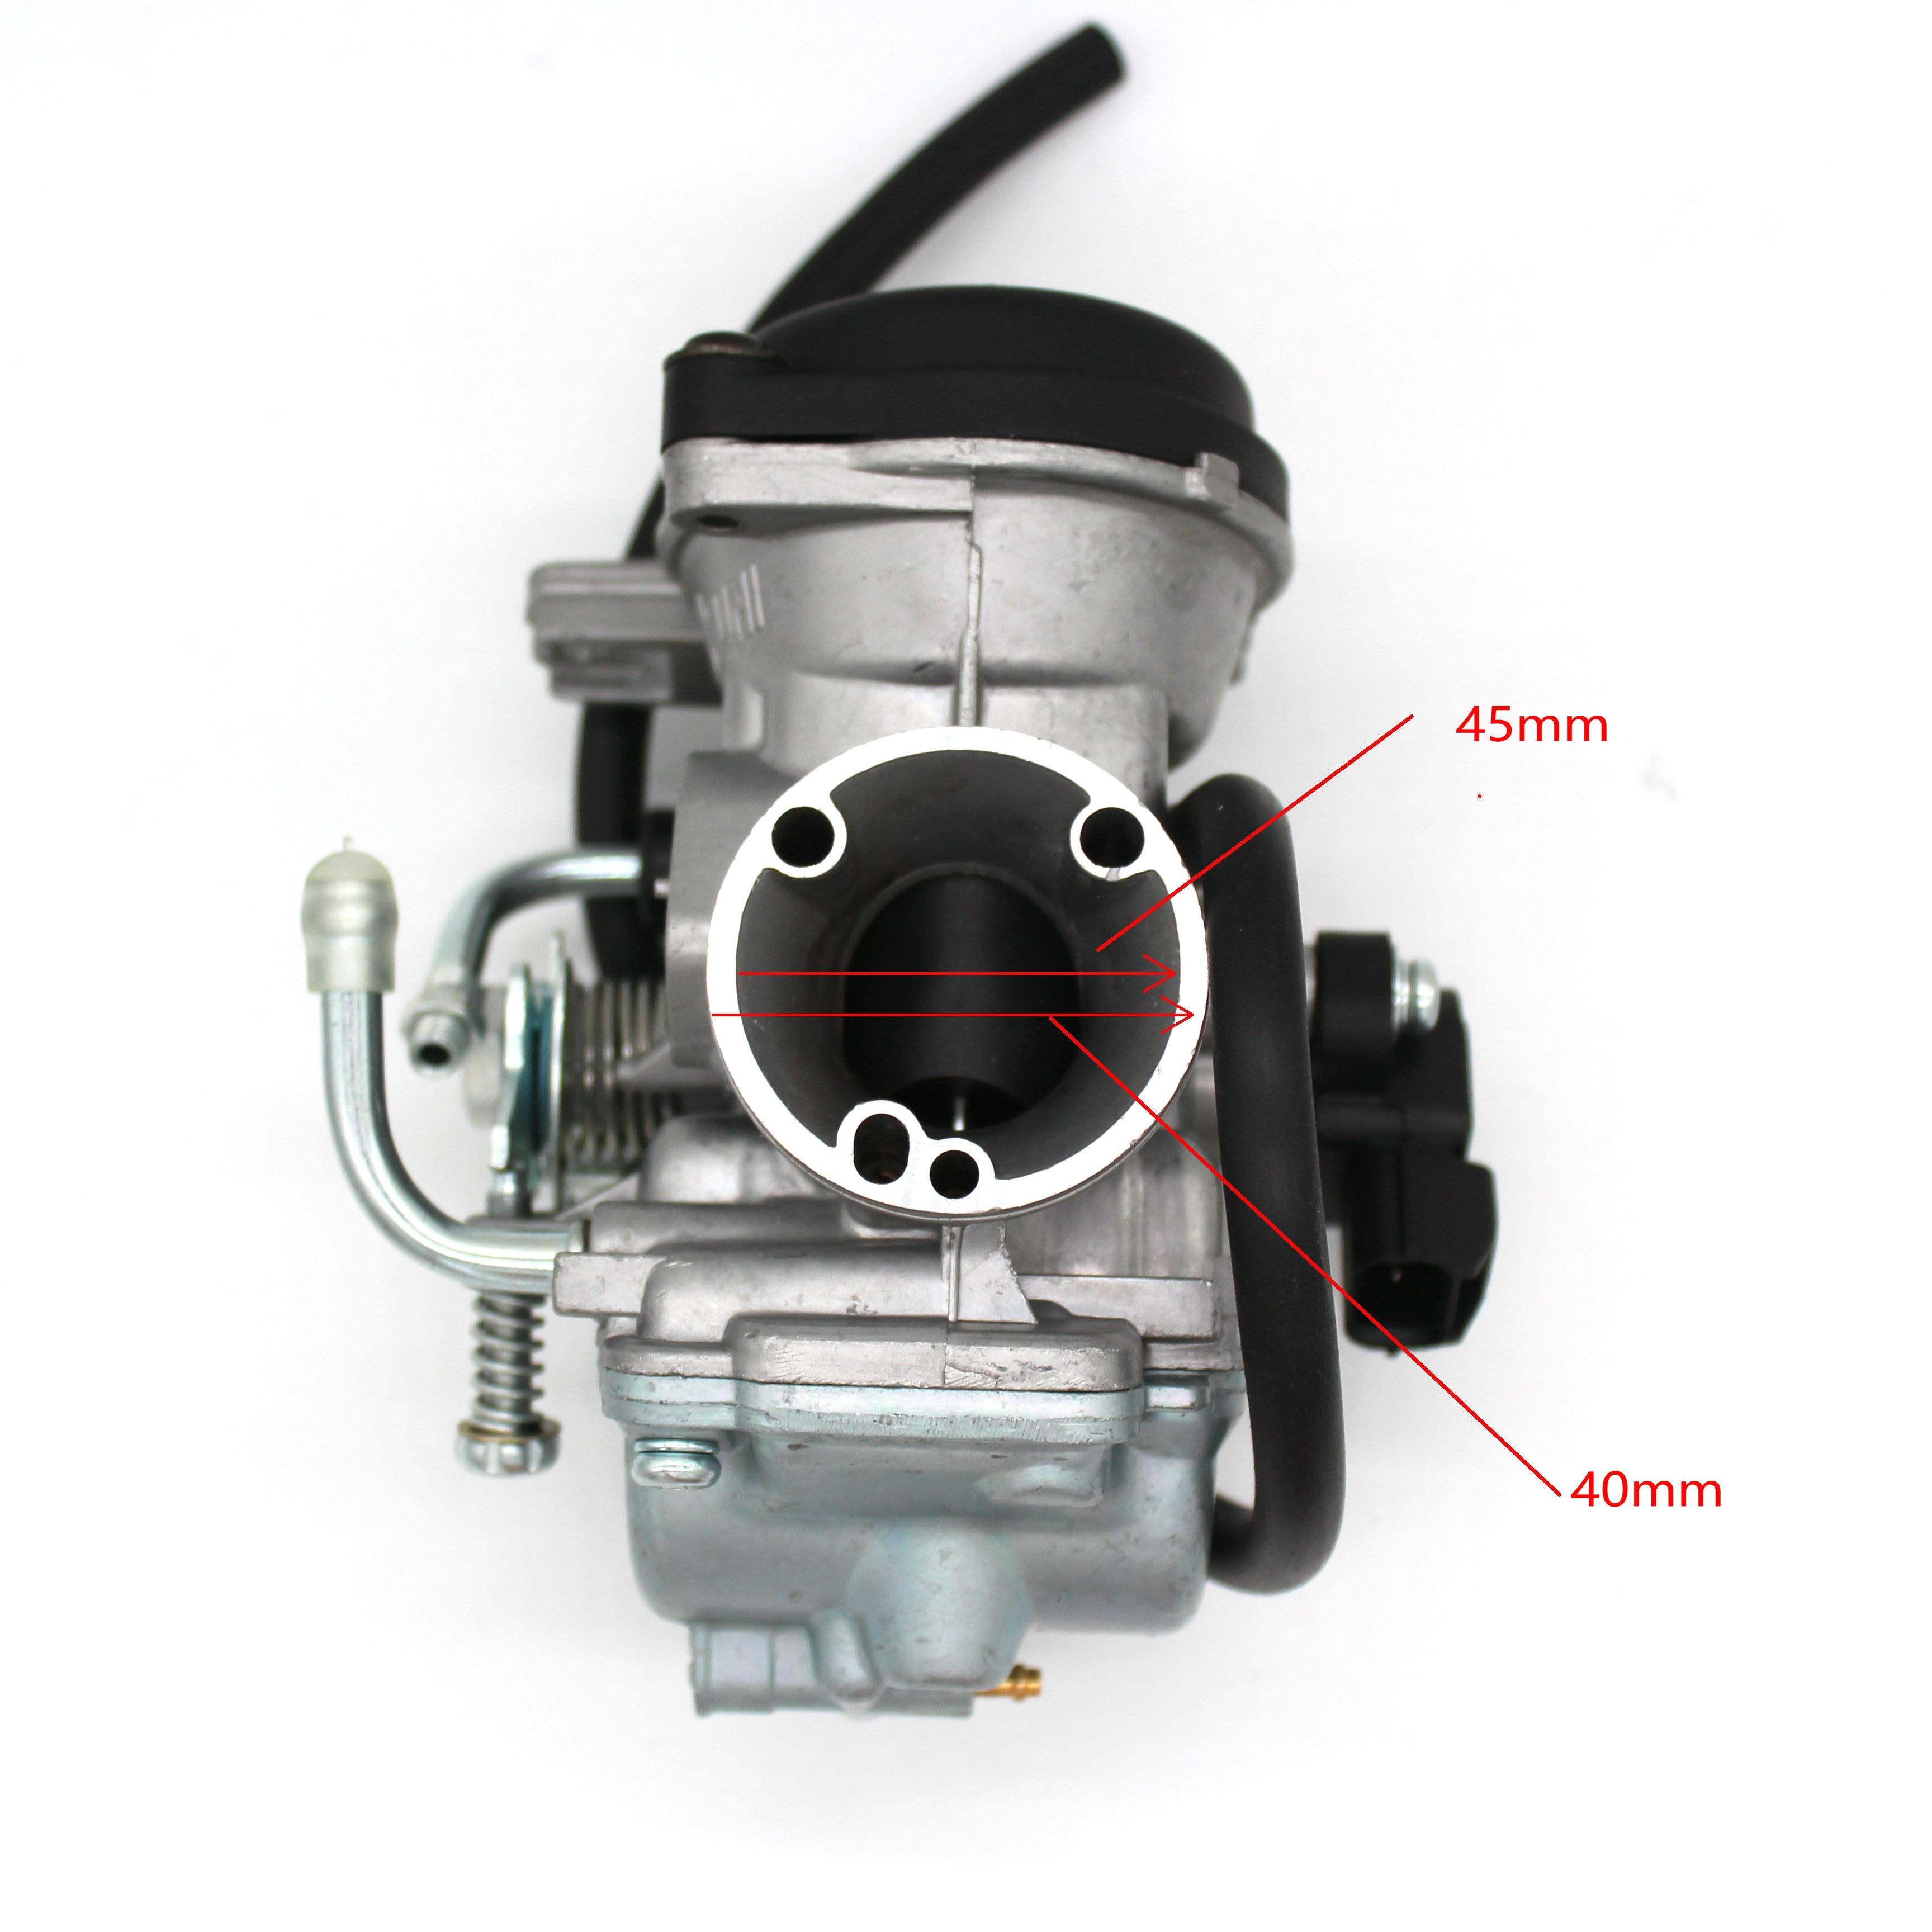 Carburateur pour Suzuki LT50 LT50 JR50 Quadrunner ATV moto Carb